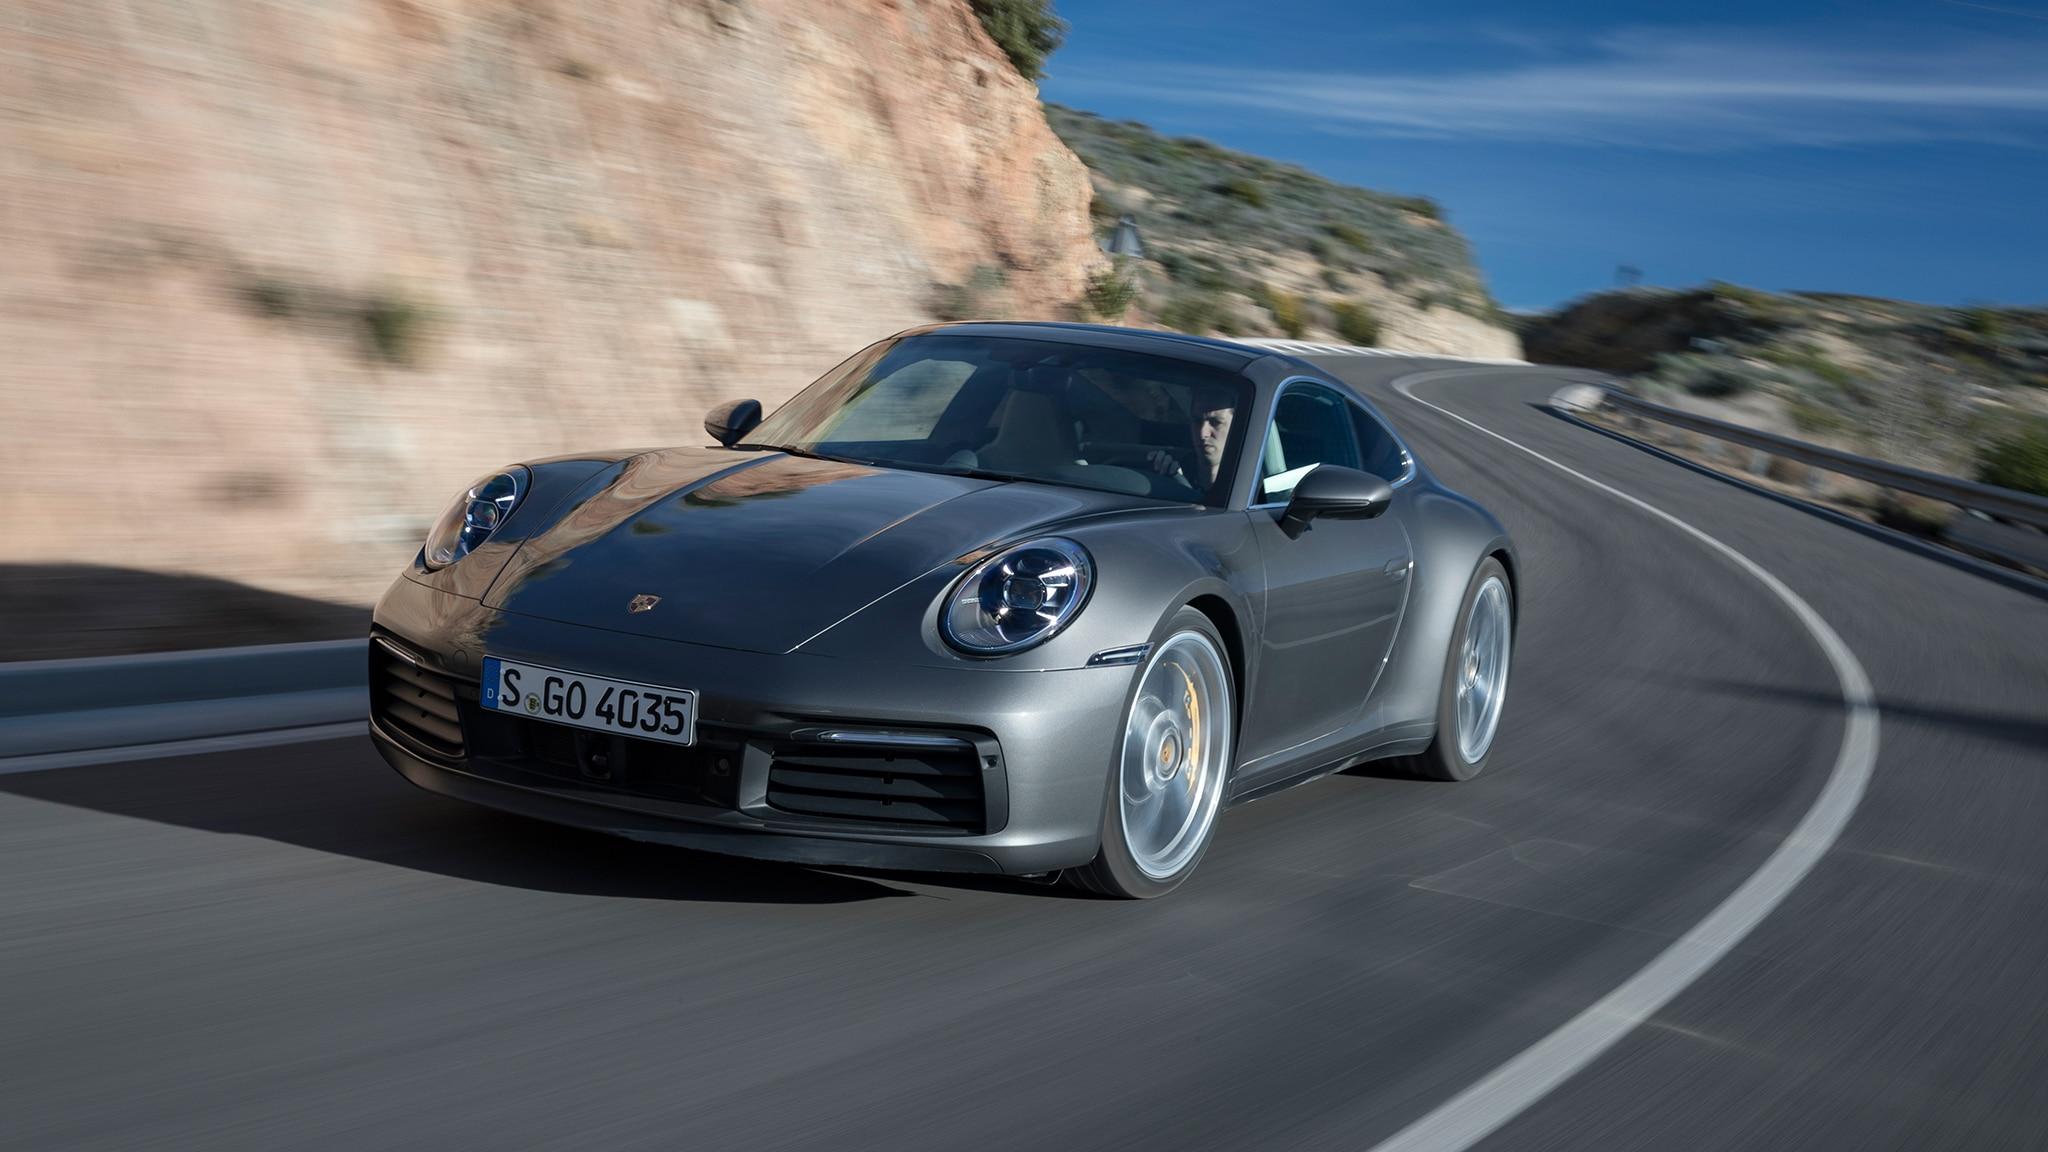 2020 Porsche 911 Carrera S 29